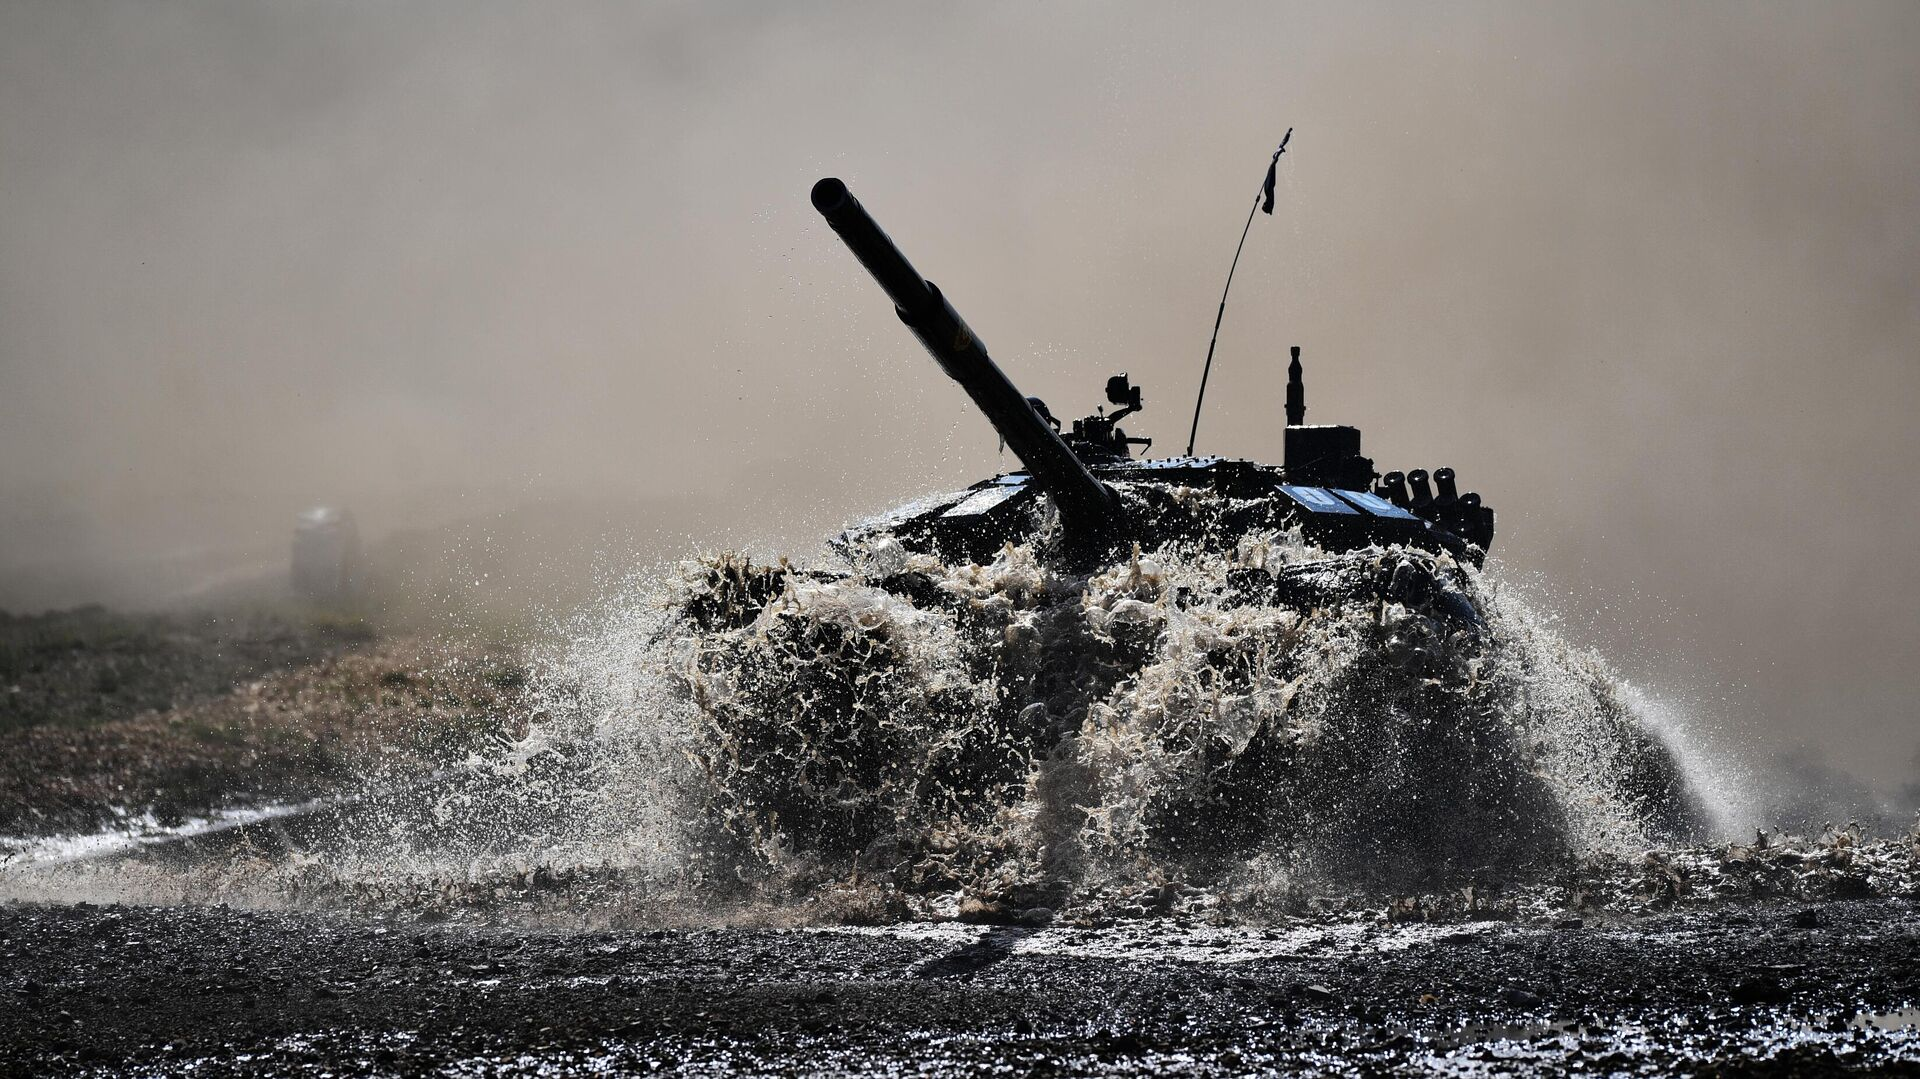 Танк Т-72Б3 - РИА Новости, 1920, 12.09.2021